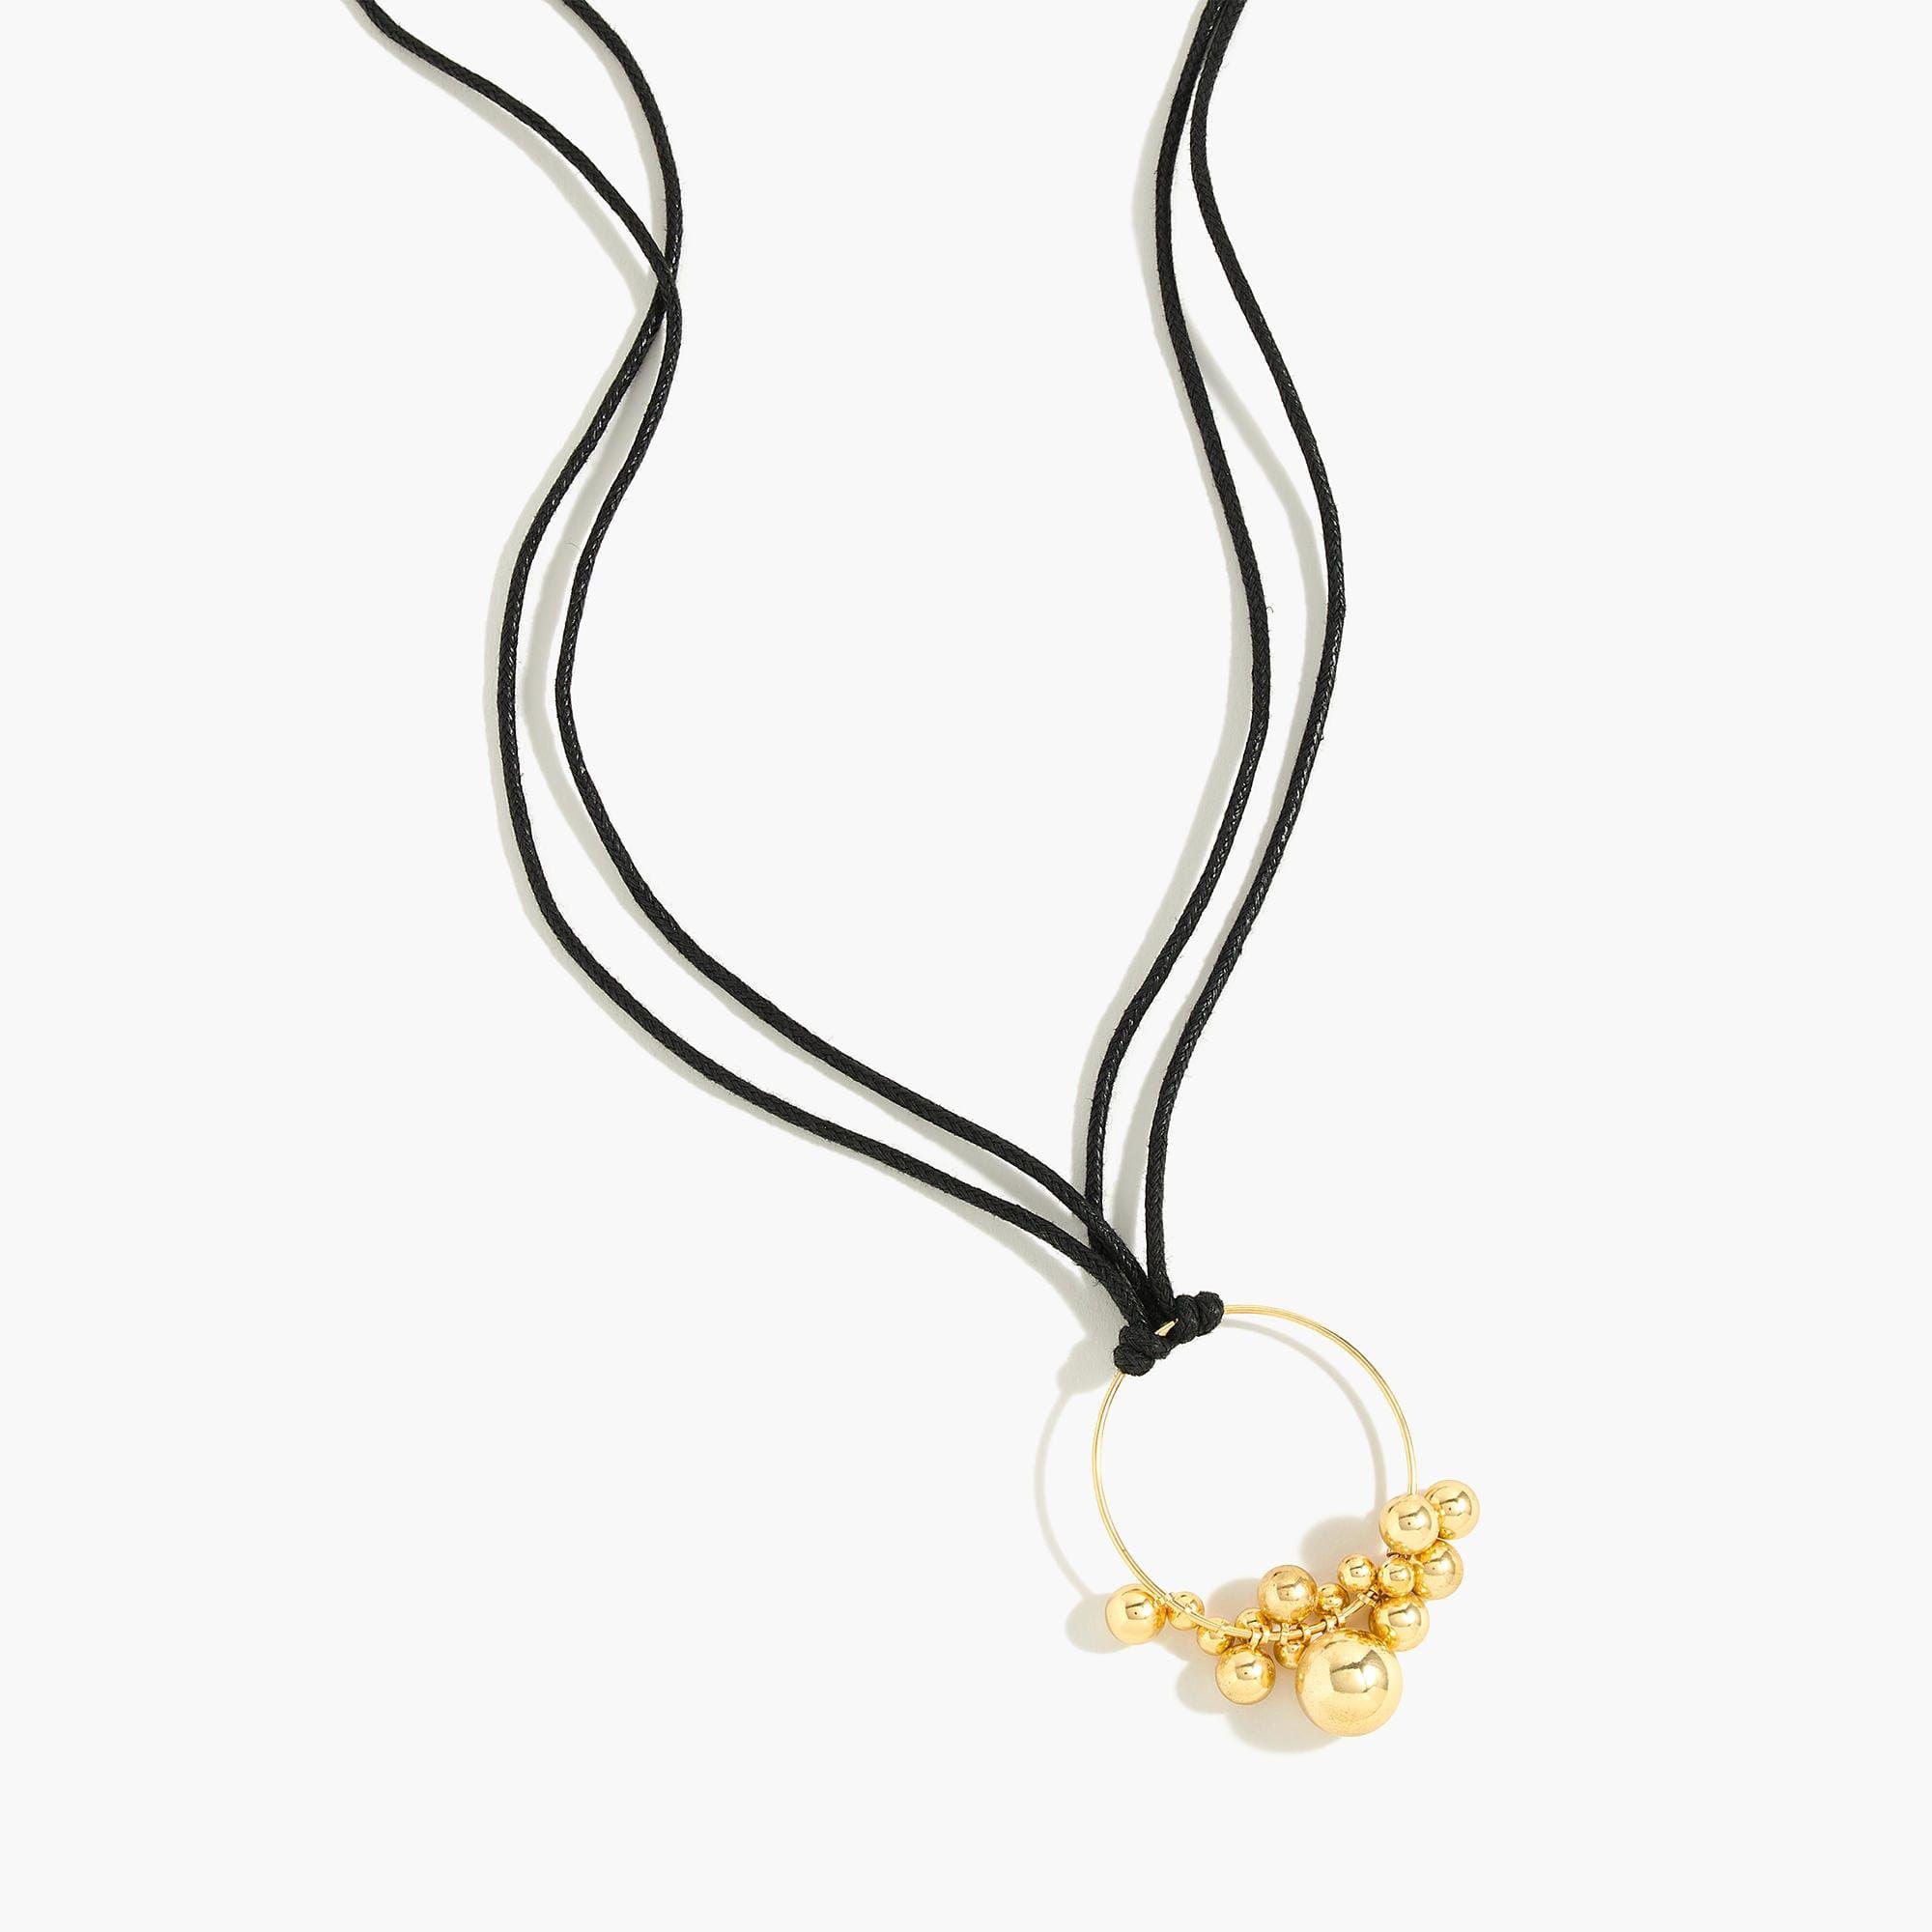 Orbs pendant necklace pendants